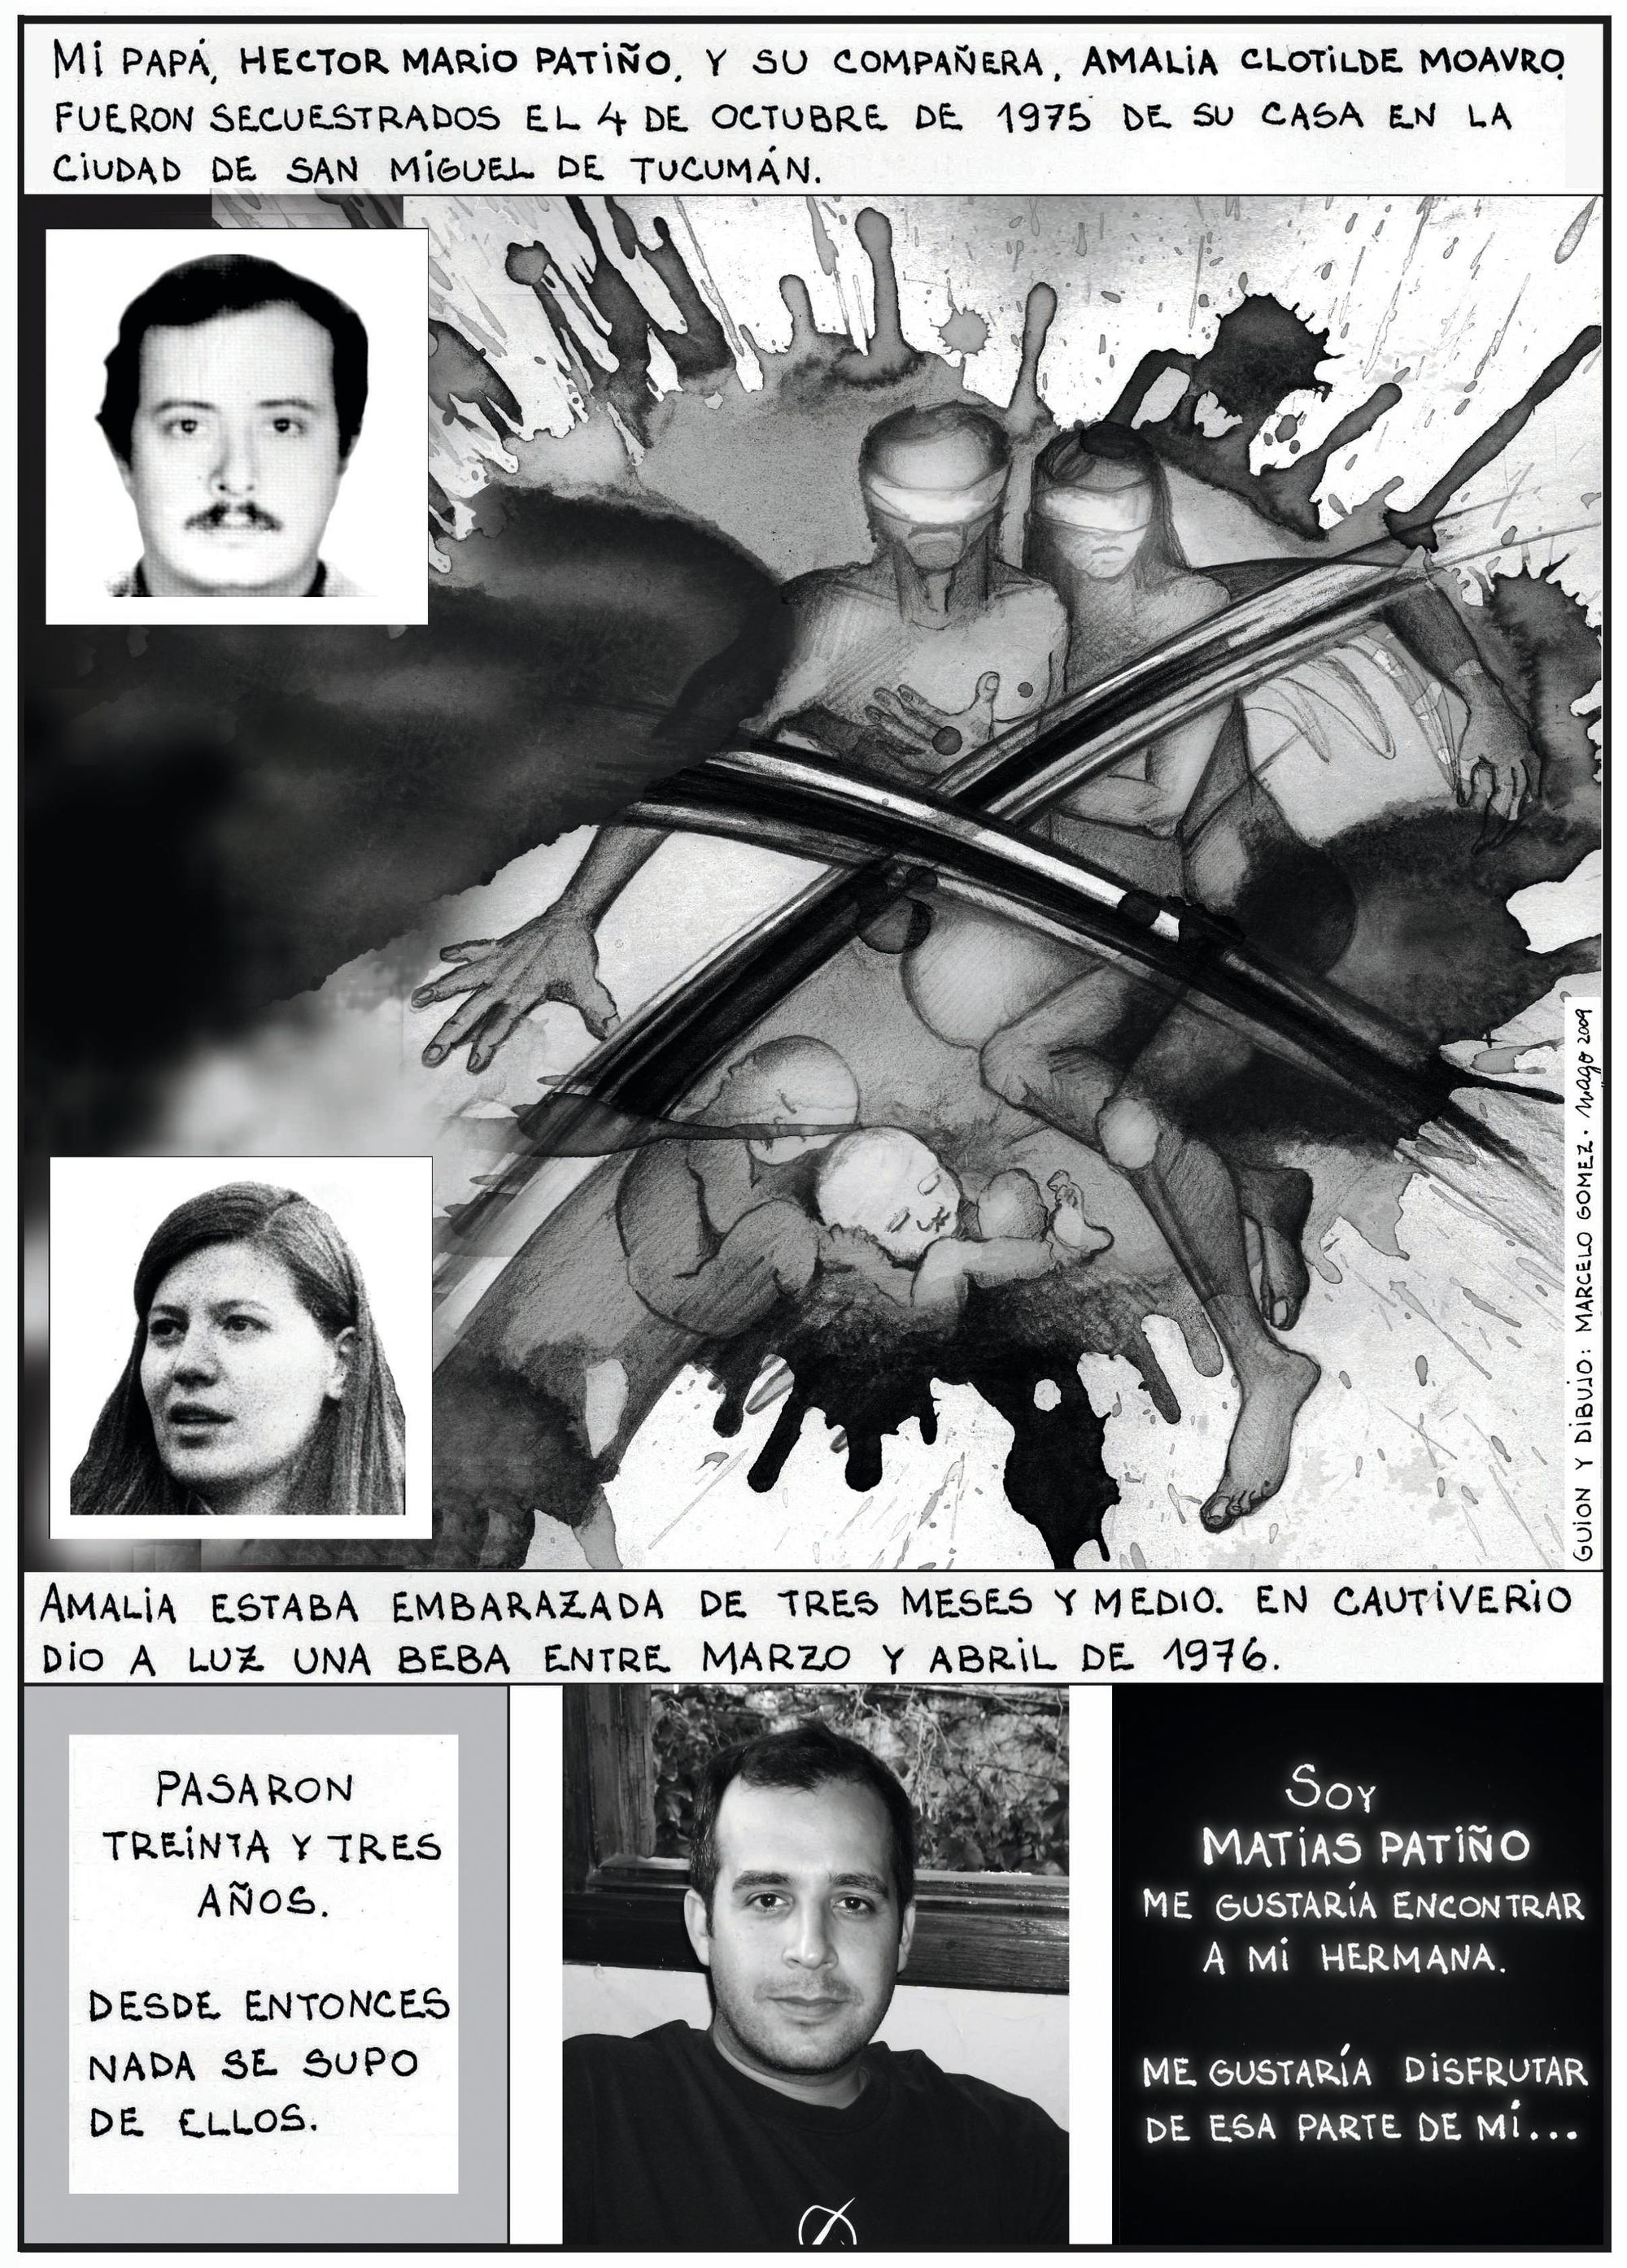 Marcelo Gómez, Historietas por la identidad 2